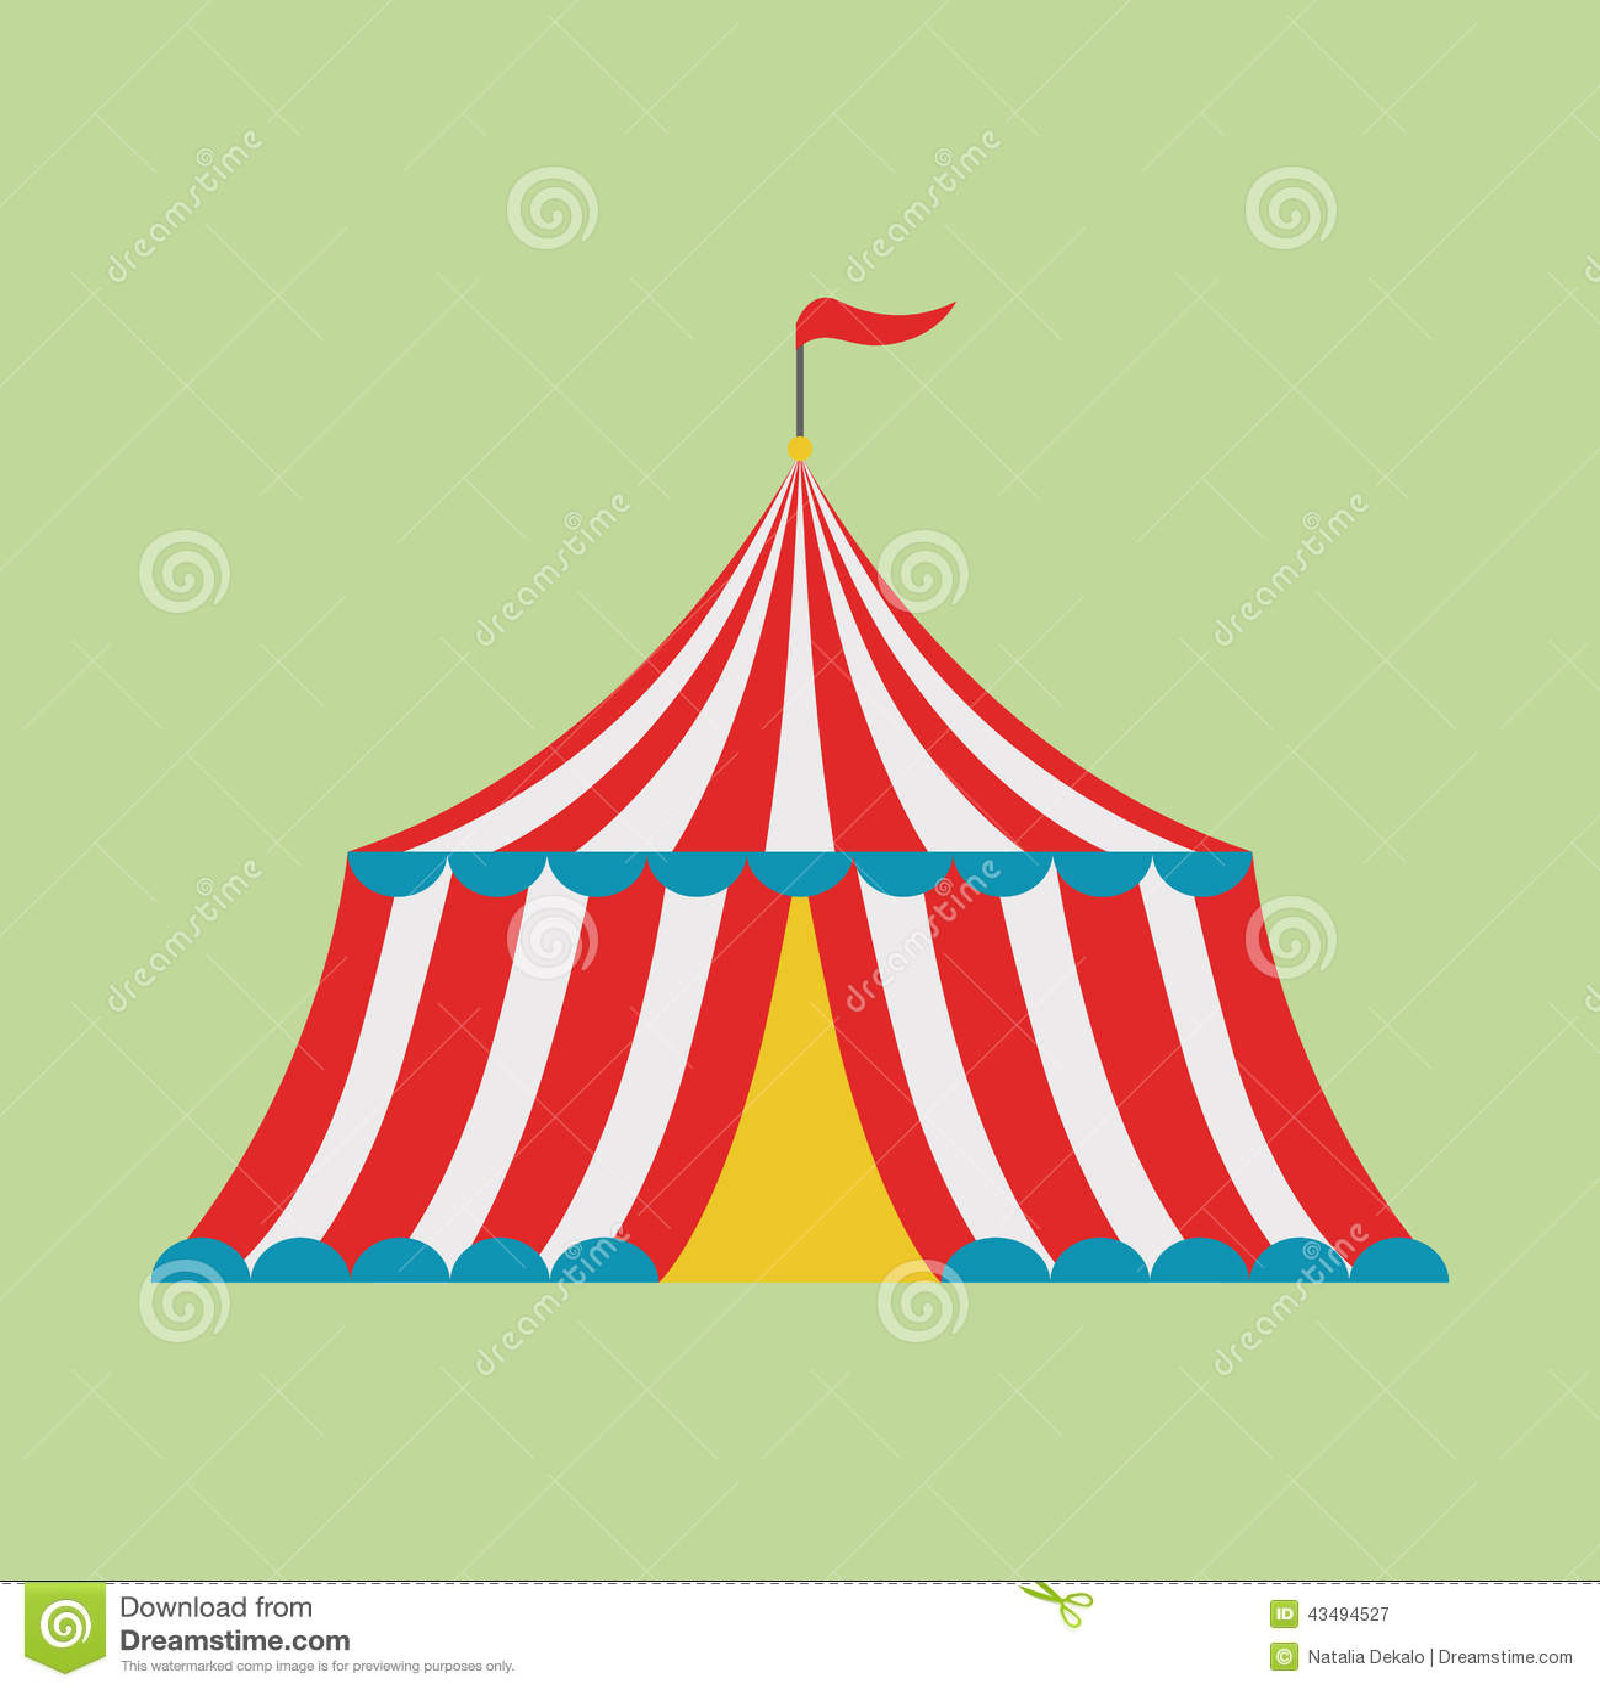 Circus tent stock vector. Image of cartoon, childhood ...